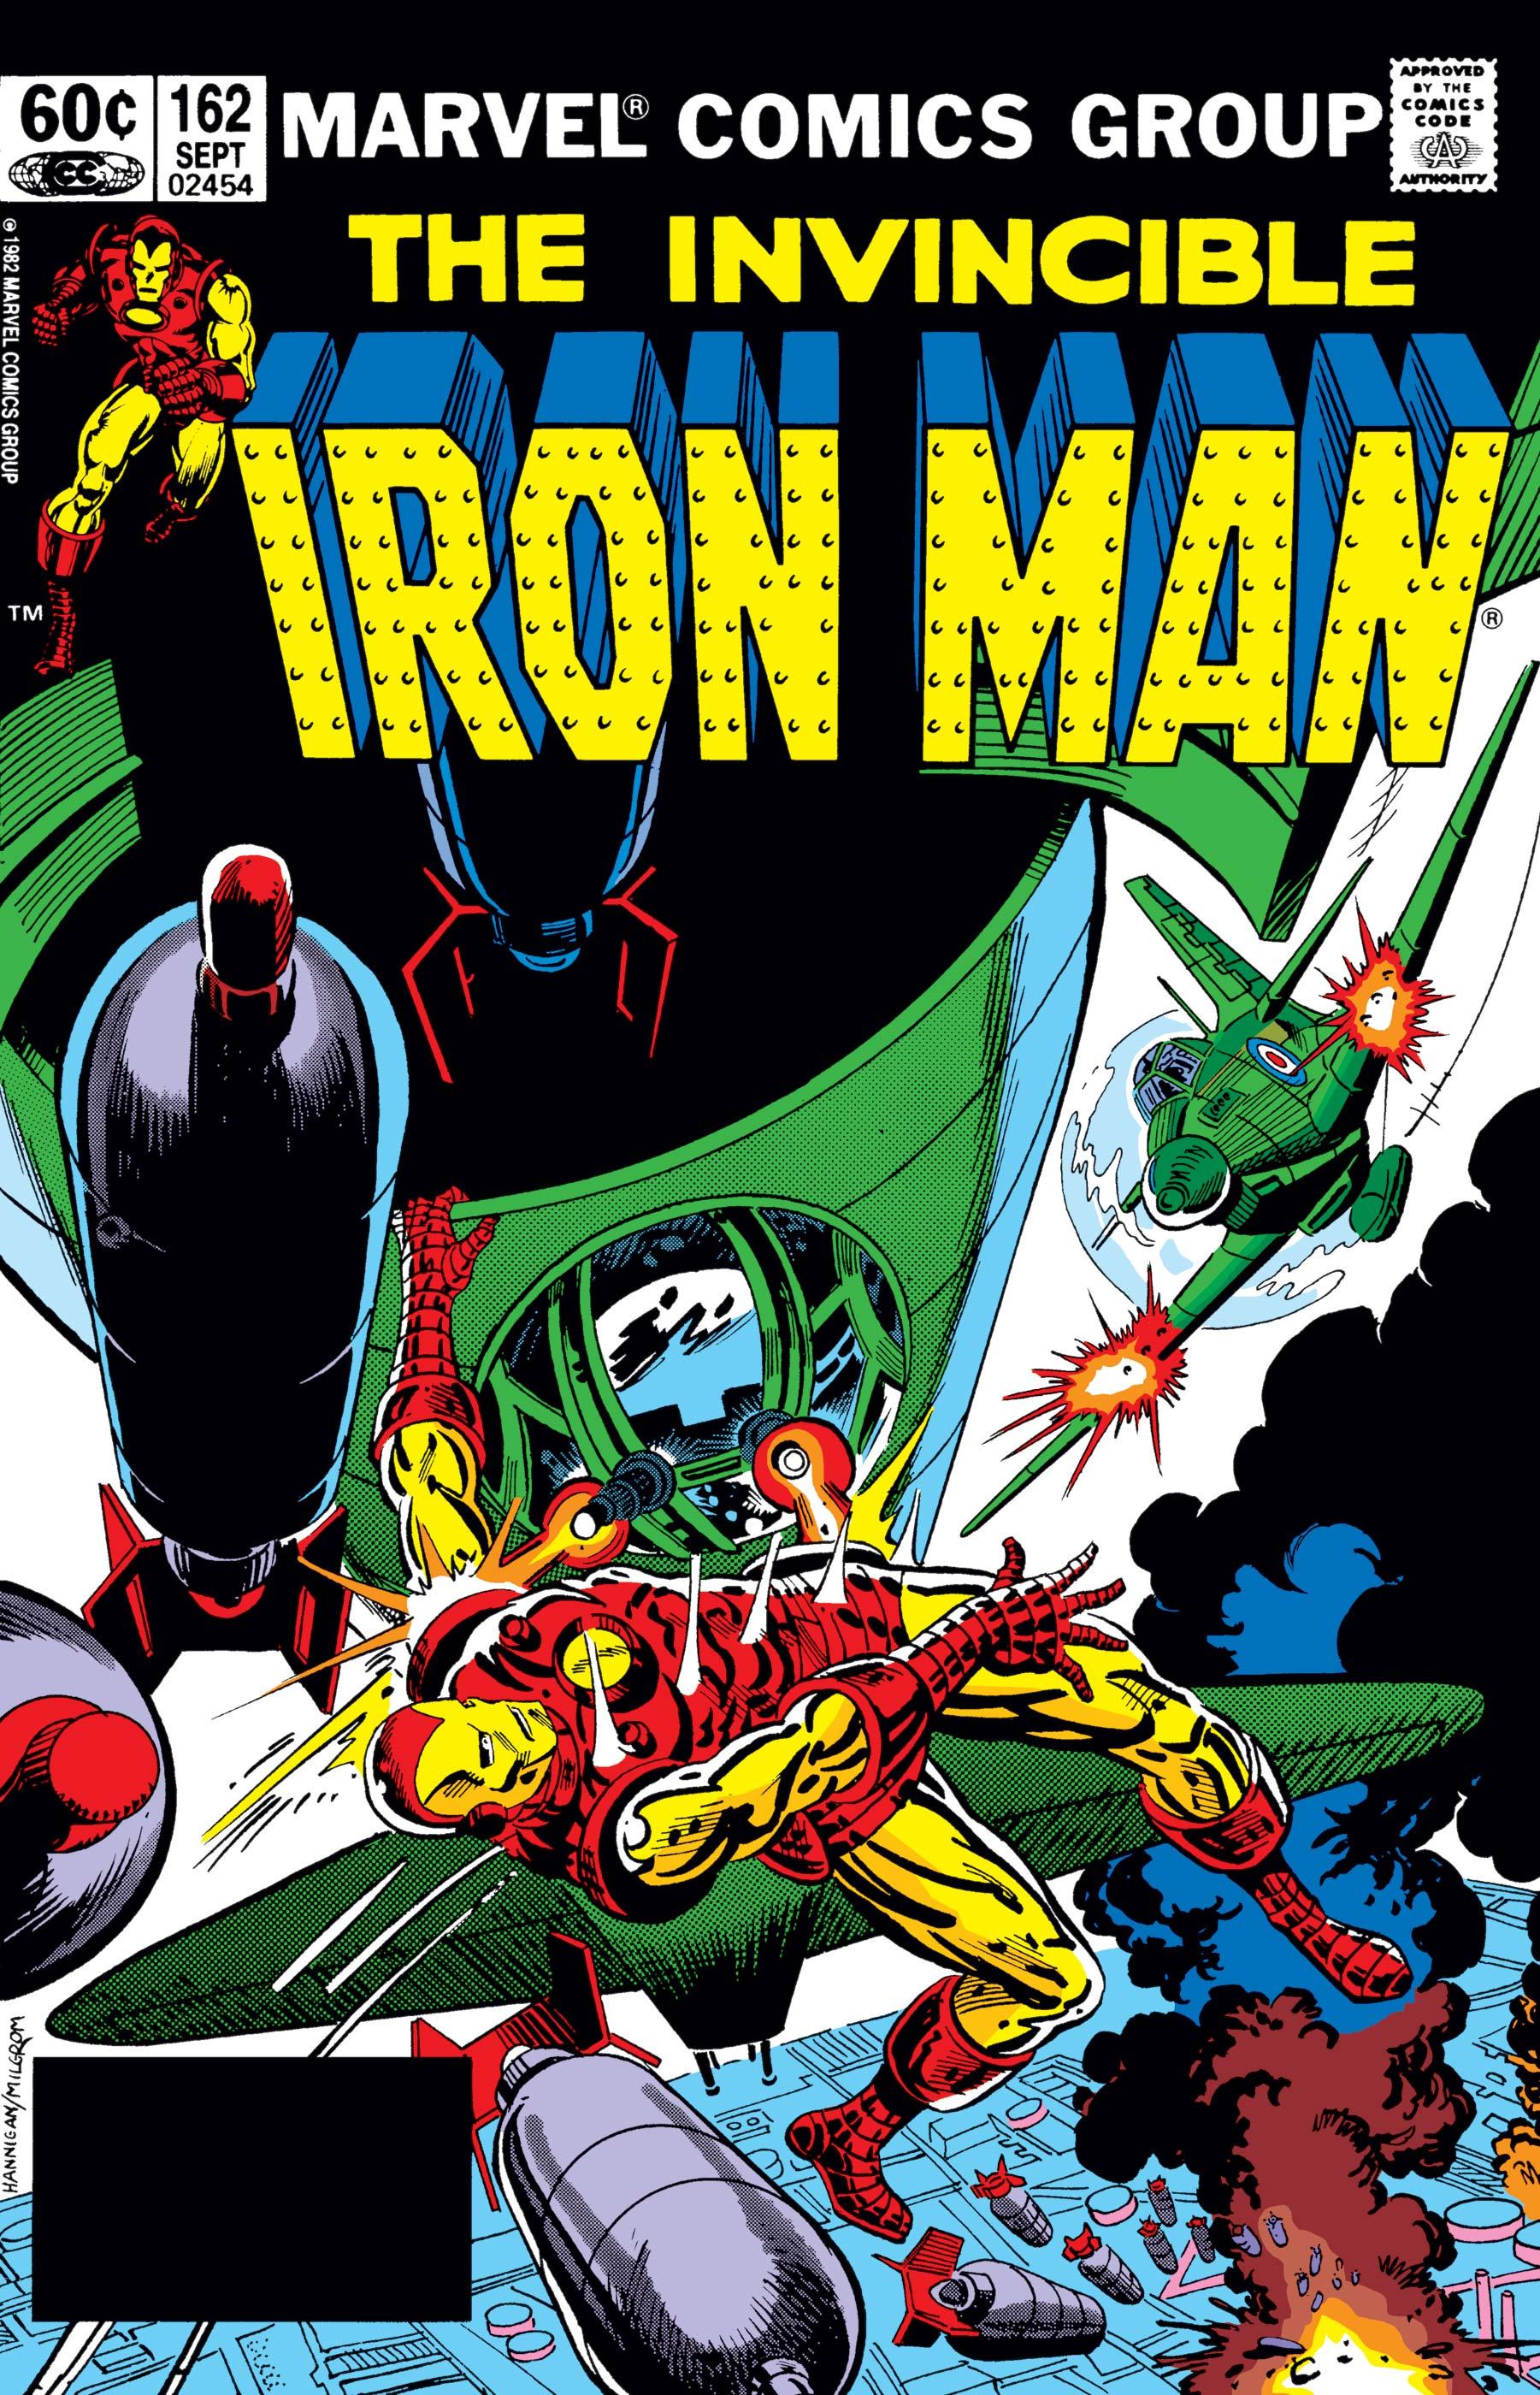 Iron Man (1968) #162